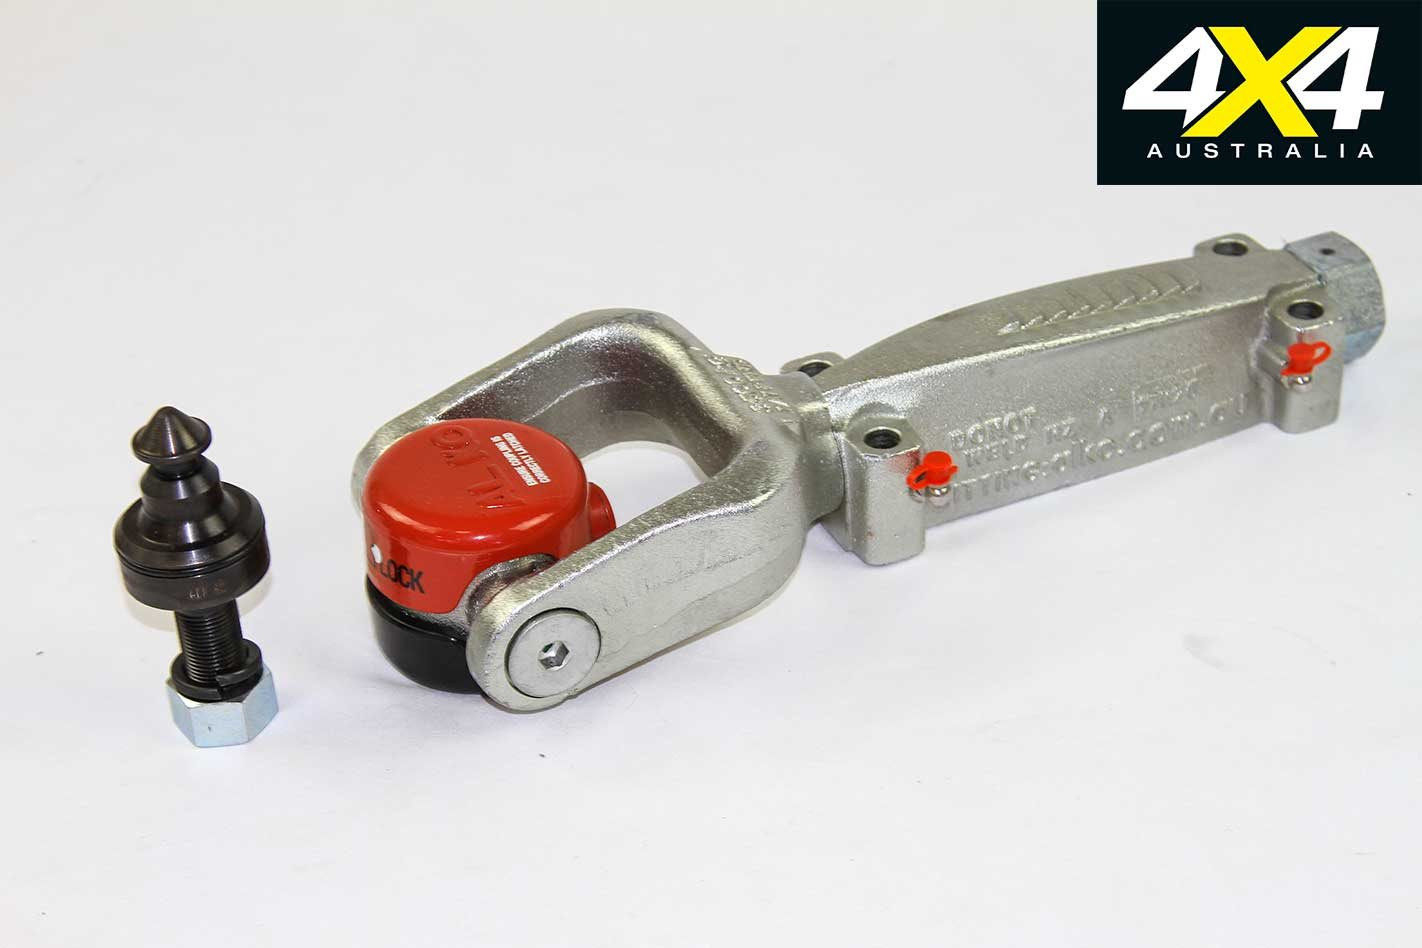 Al-ko® Offroad Pin Coupling